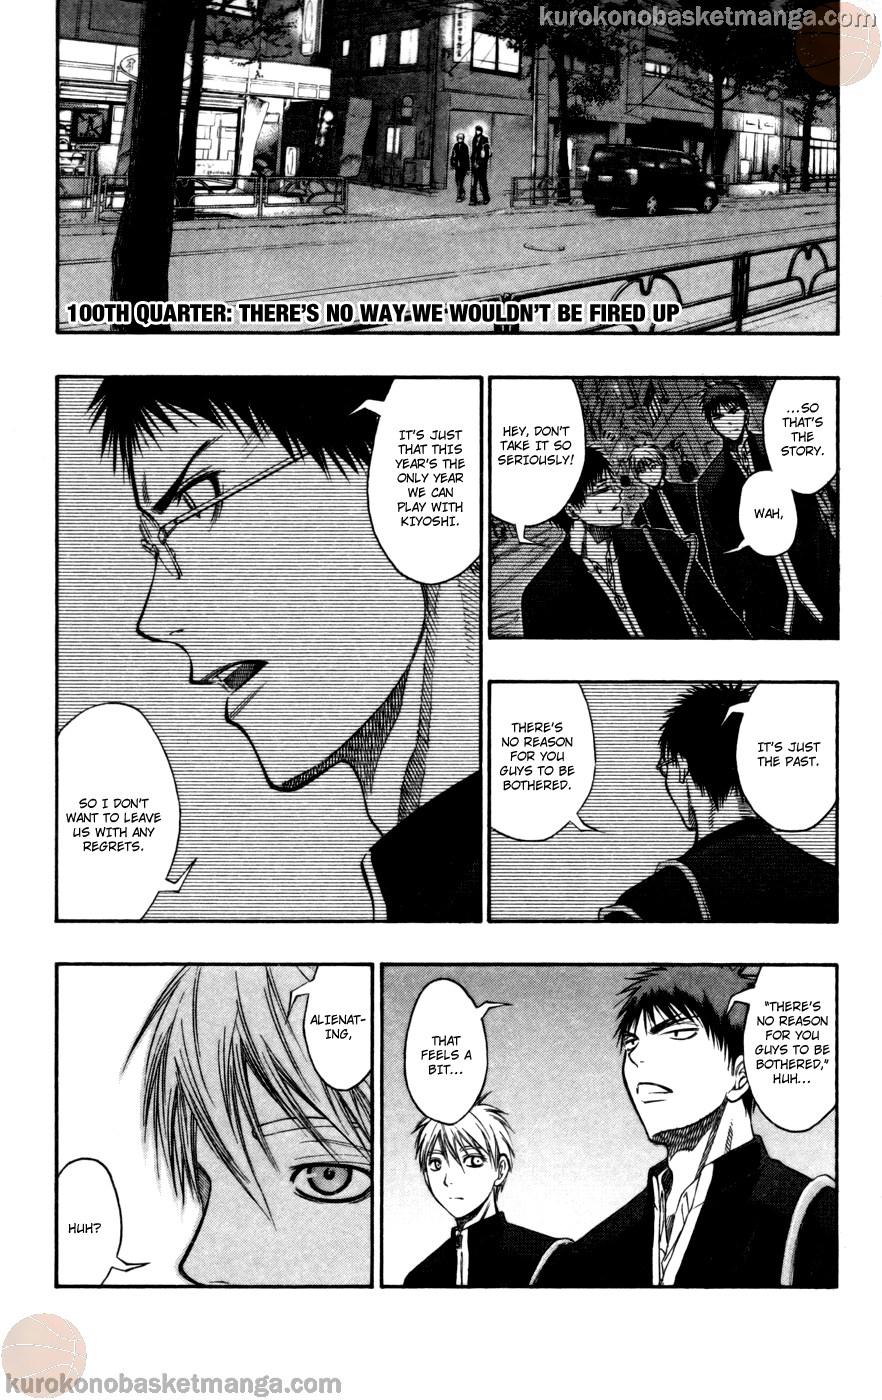 Kuroko no Basket Manga Chapter 100 - Image 05